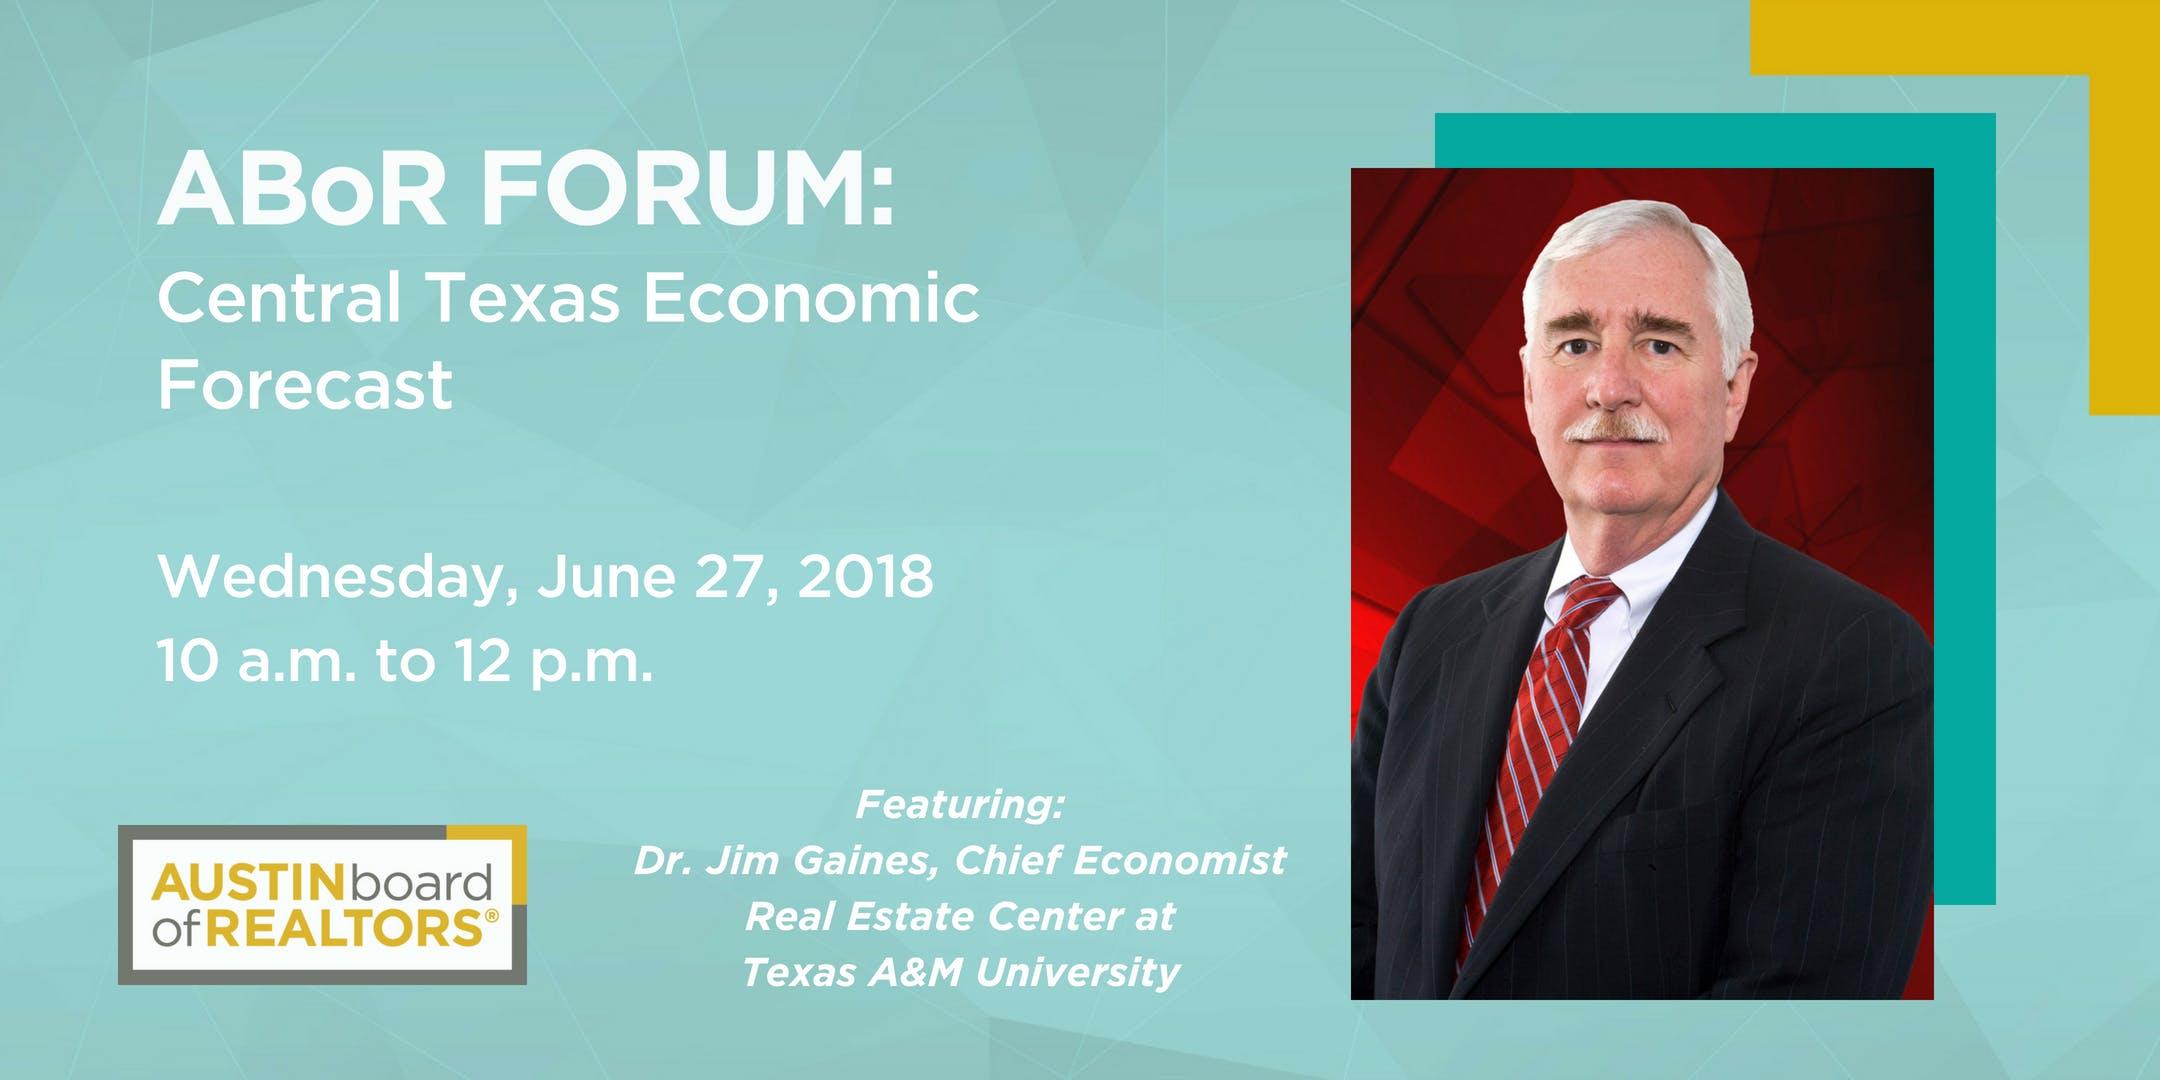 ABoR Forum Central Texas Economic Forecast